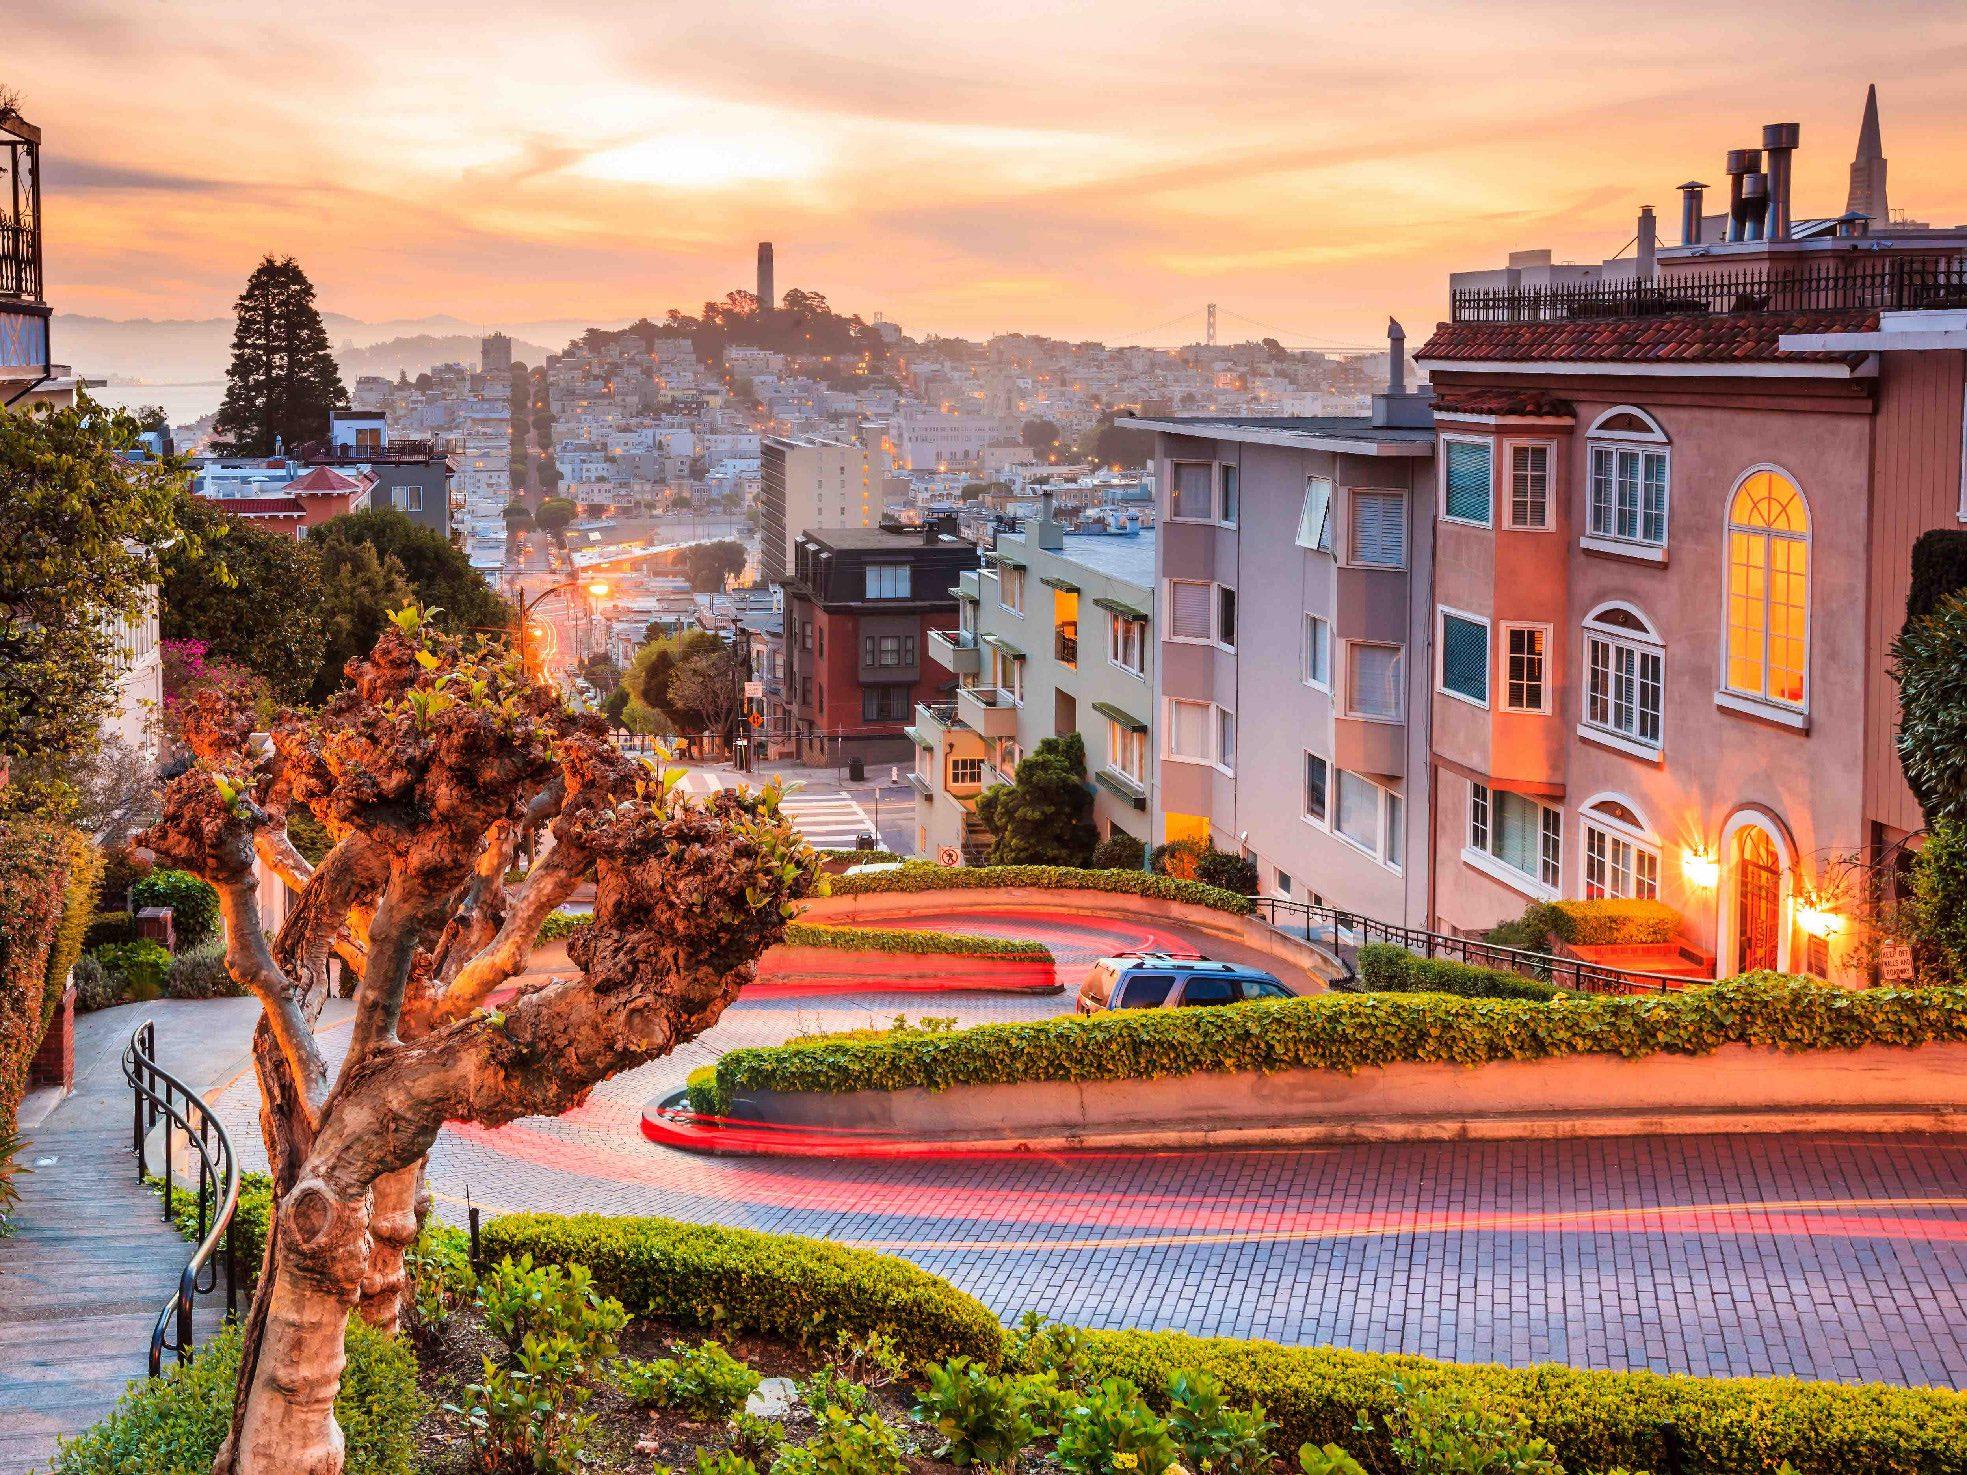 San-Francisco-residential-neighborhoods-lombard-street